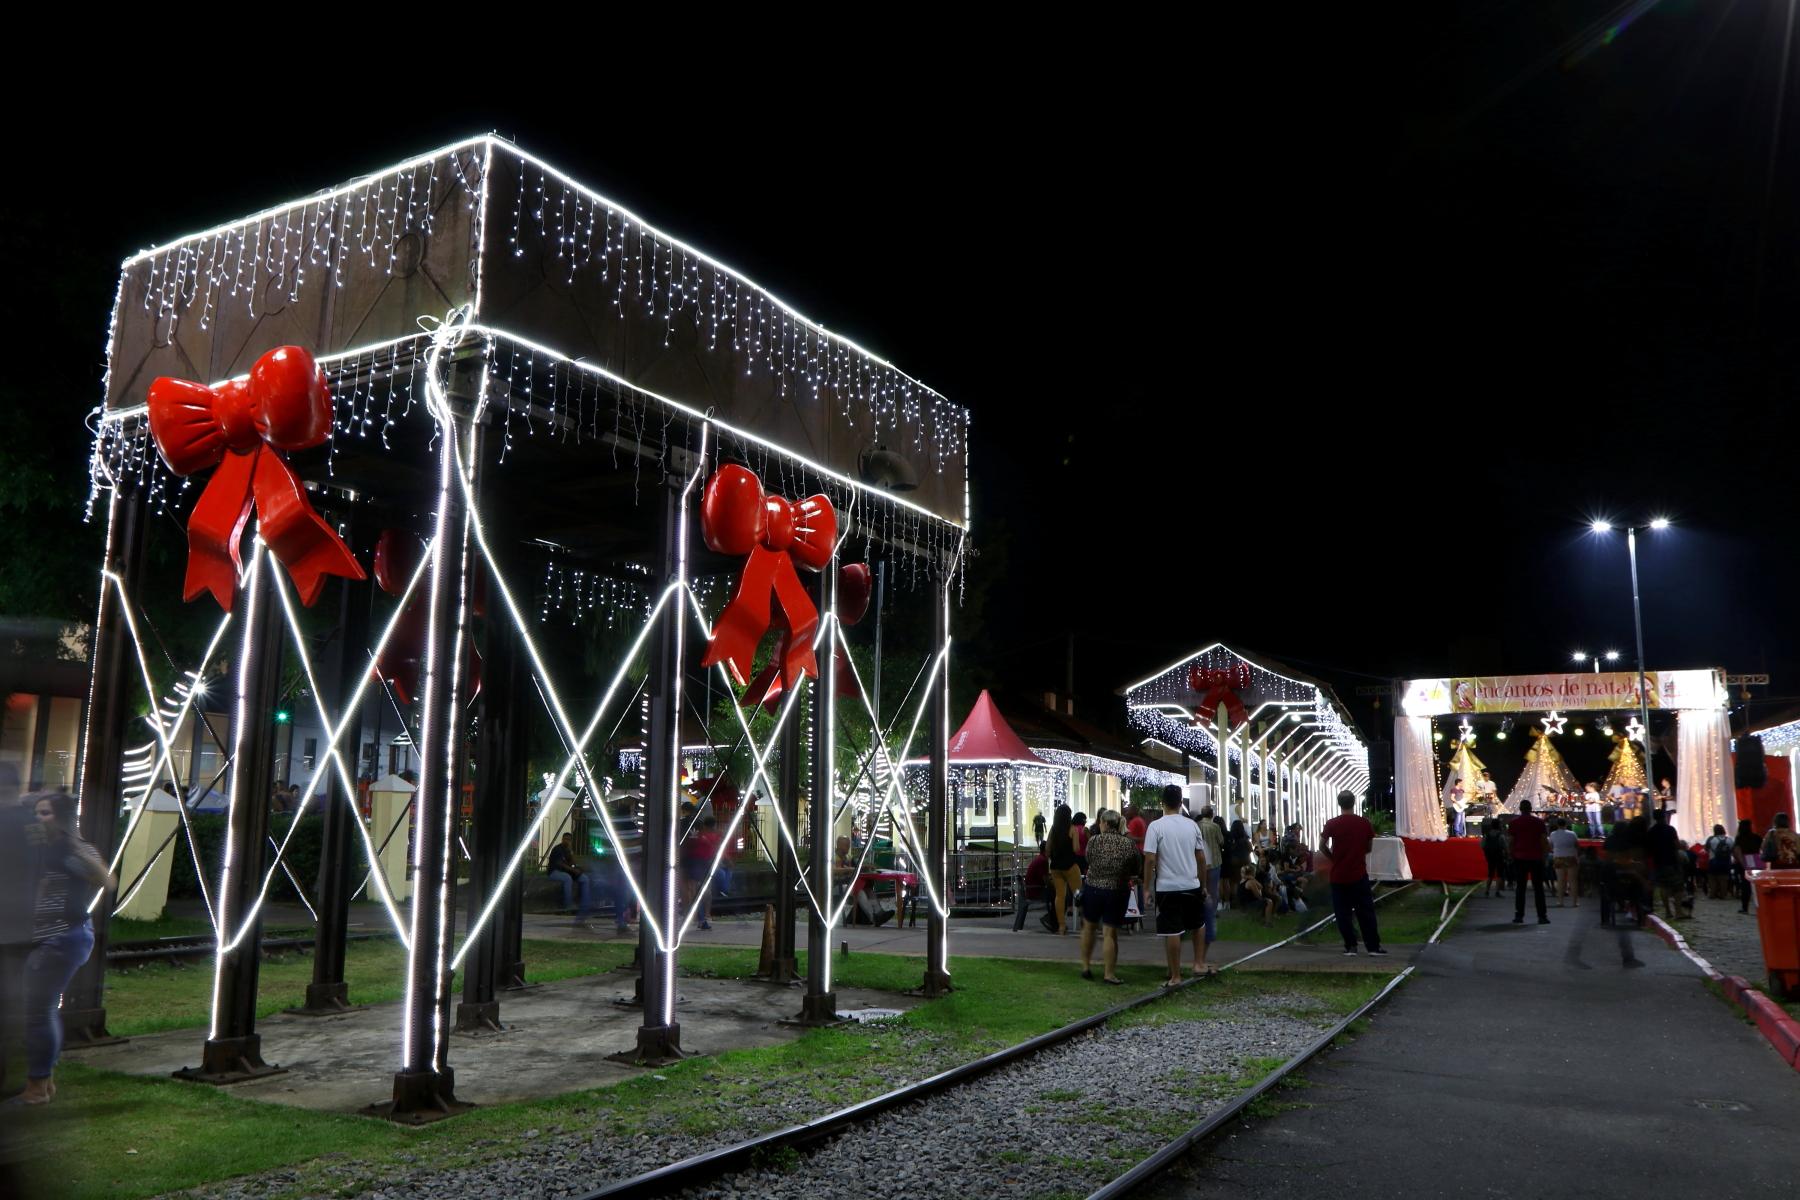 Caravana com Papai Noel irá aos bairros de Jacareí a partir de segunda-feira